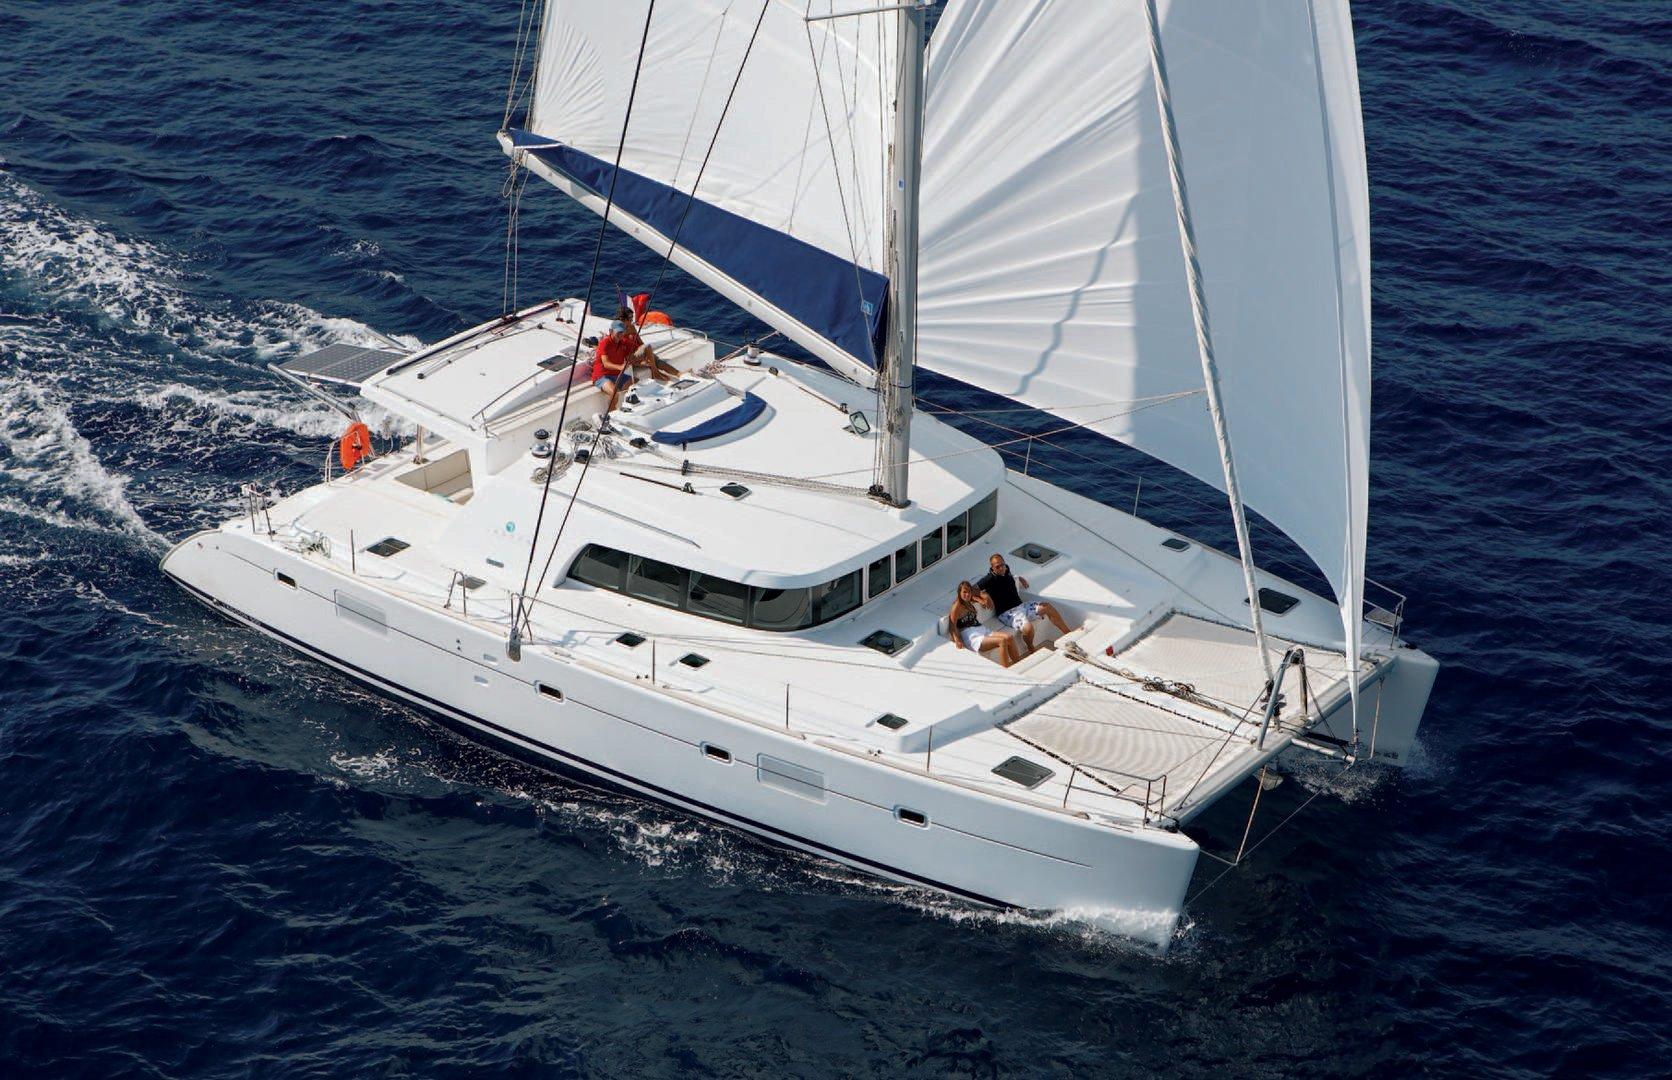 Hawaii Nautical Luxury Cataman Yacht Snorkel Sail